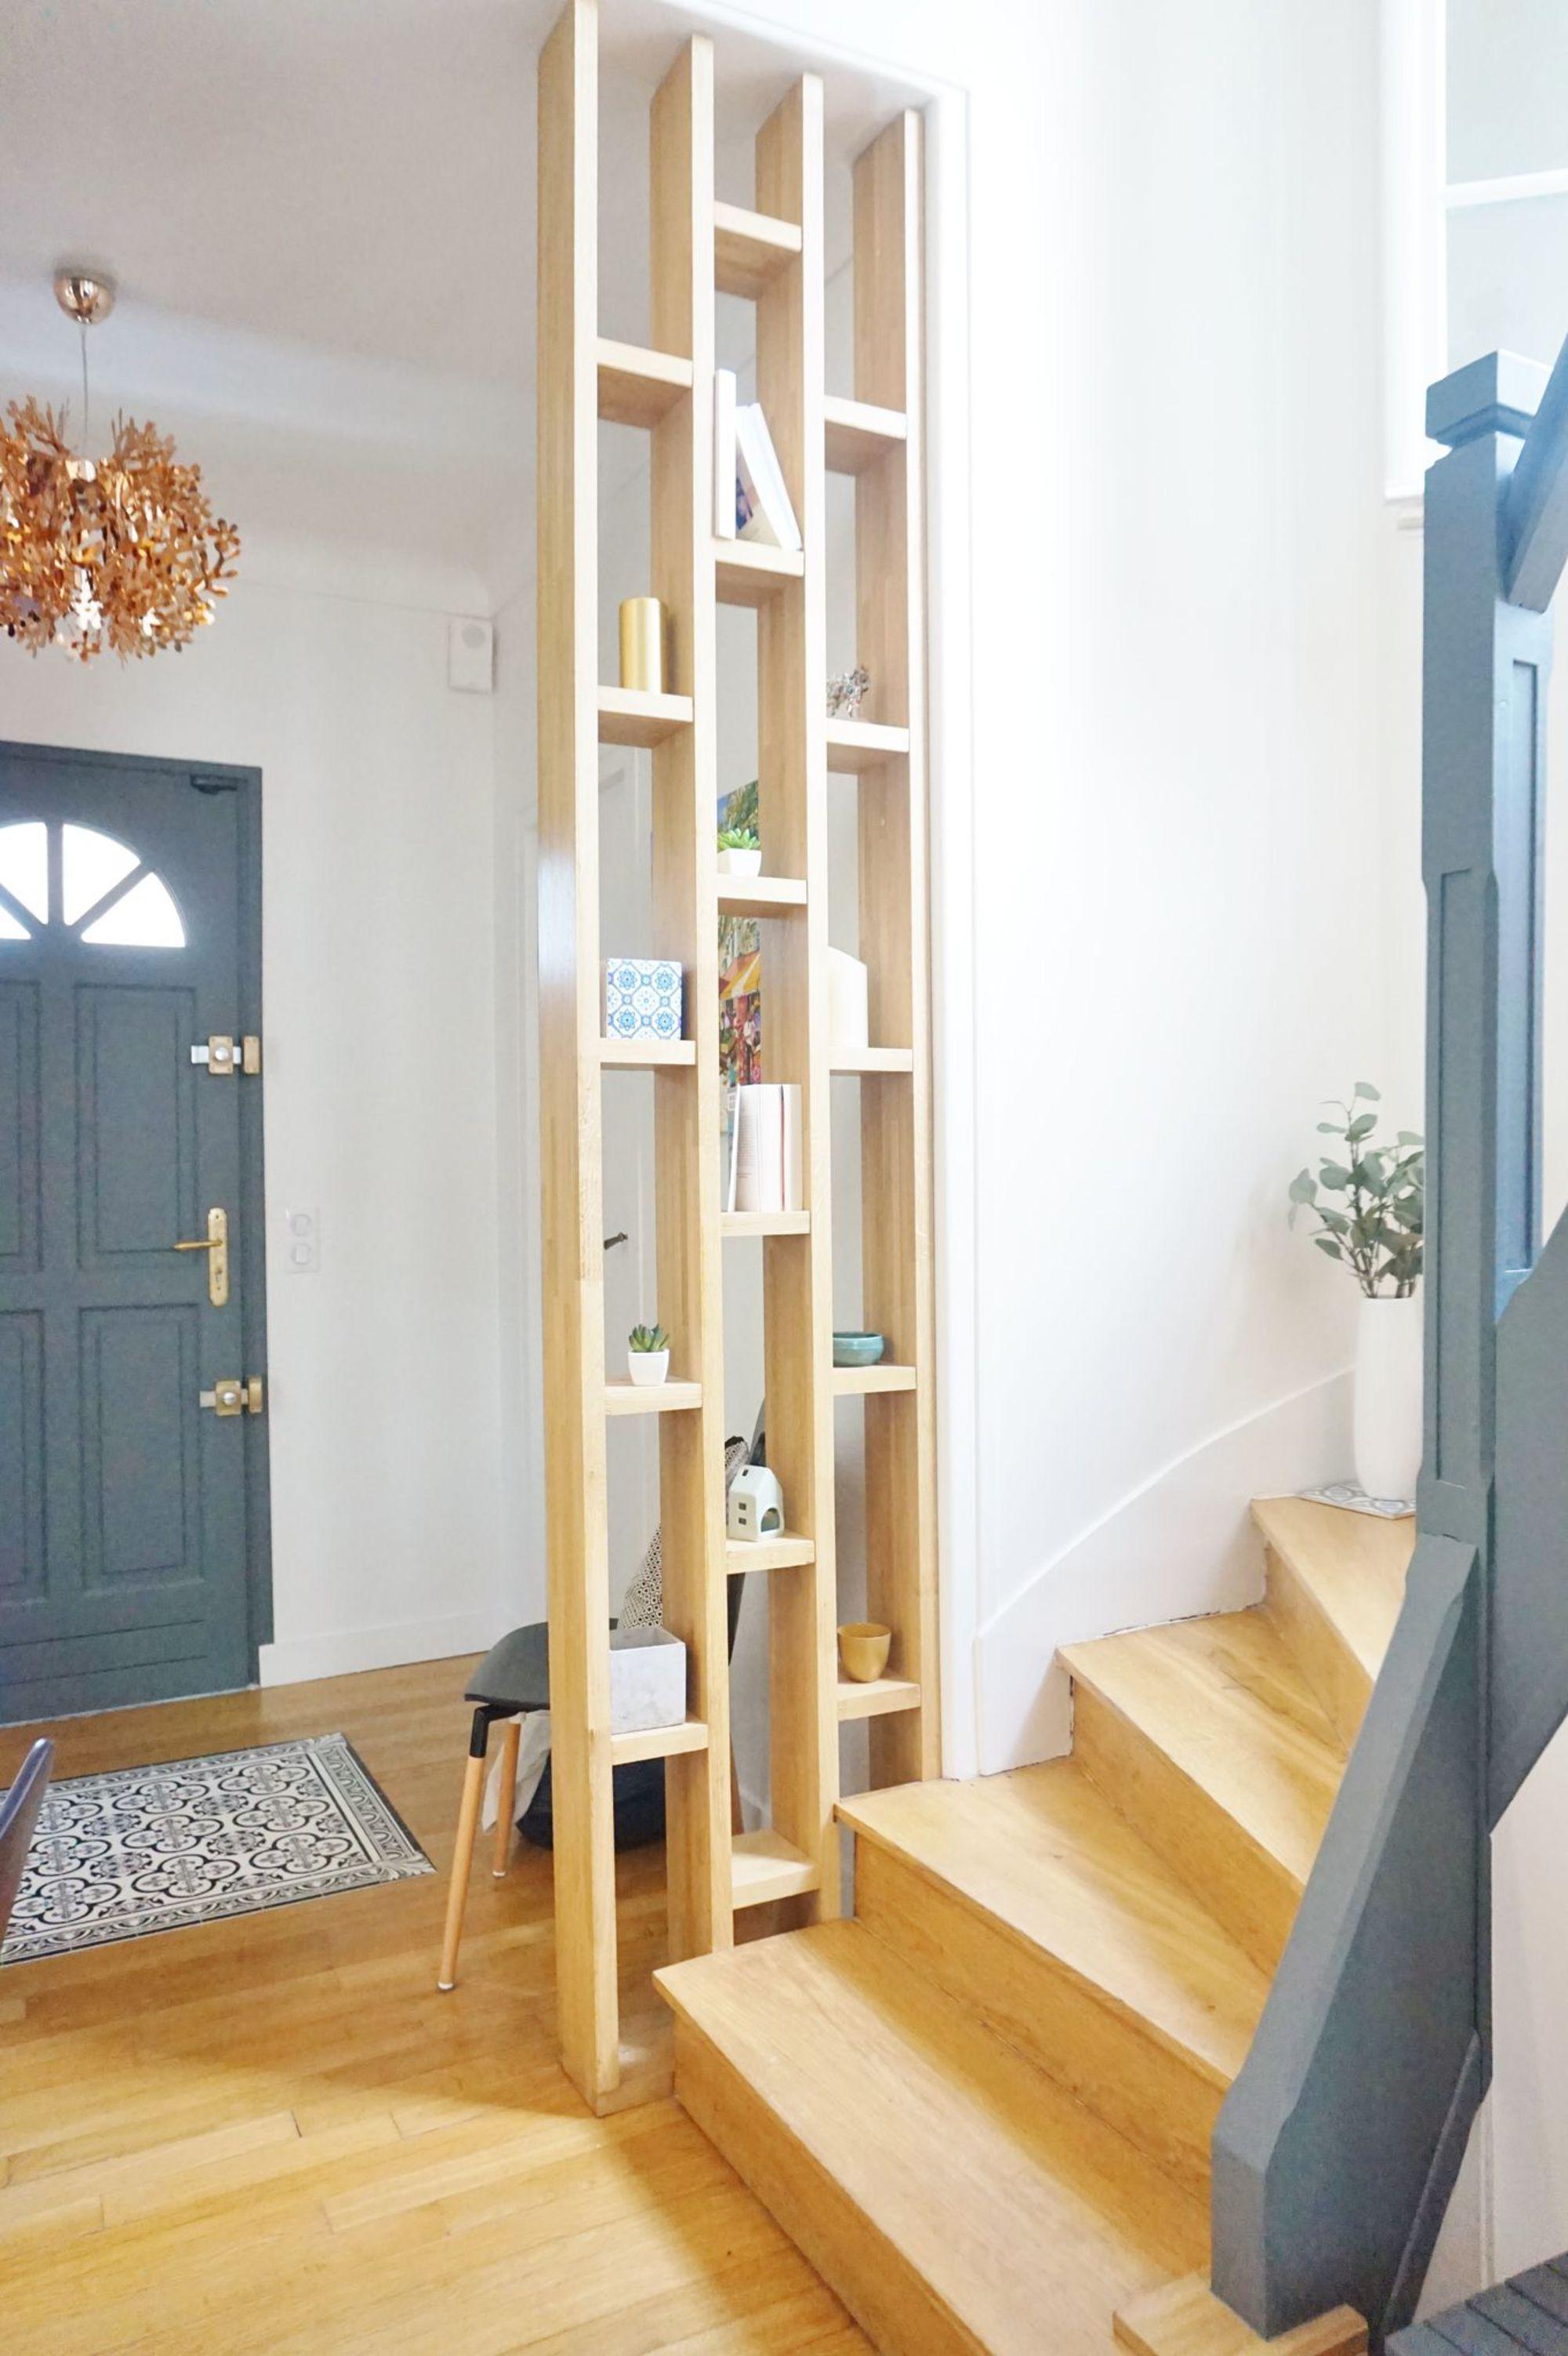 Epingle Par Morgane Paris Telaviv Sur Inspiration For My New Home